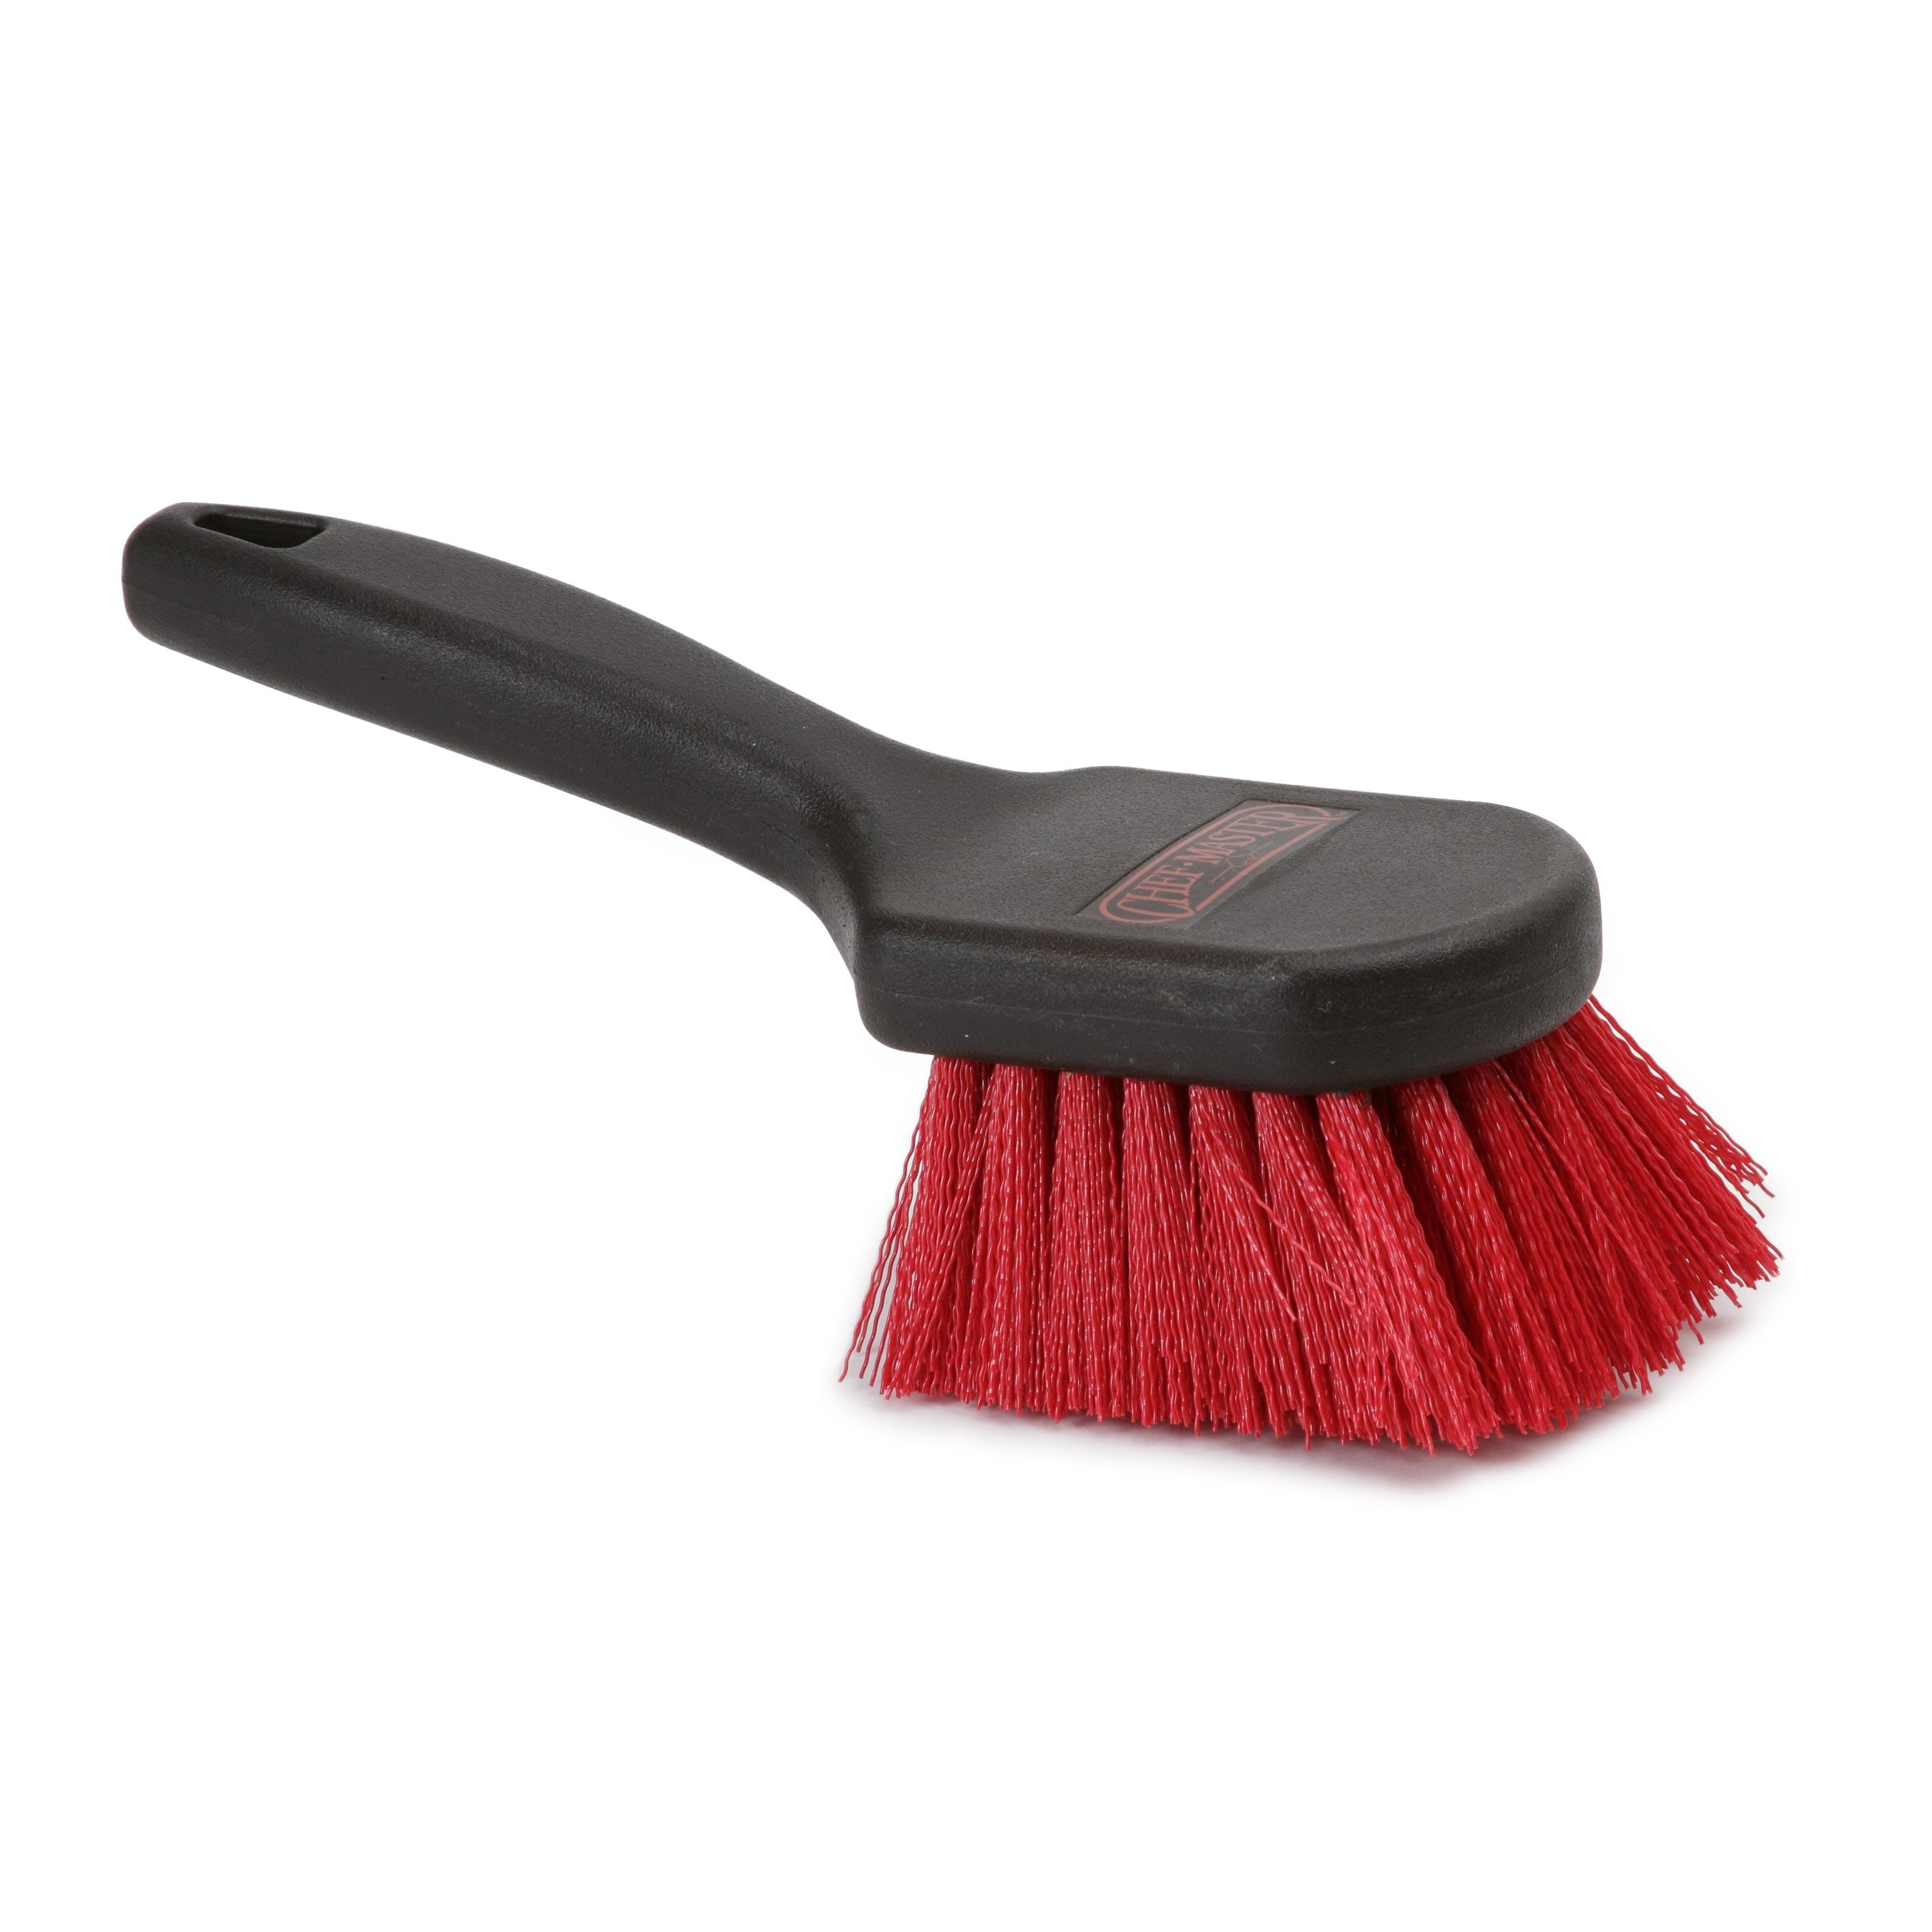 Royal Industries MR 90048 brush, kettle / pot